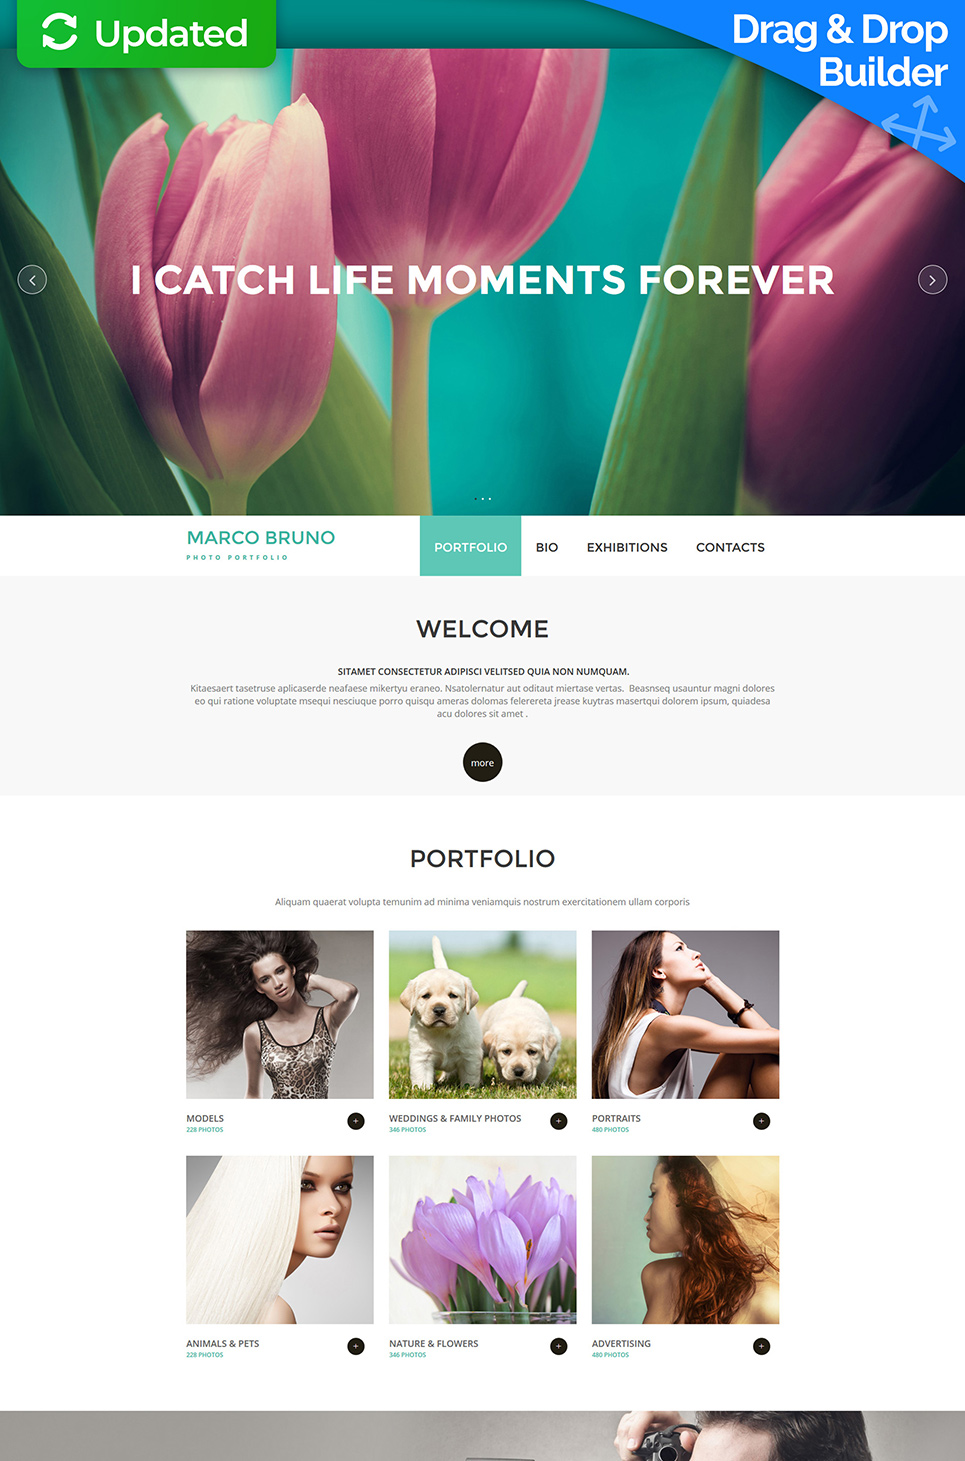 Online Art Portfolio Template - image